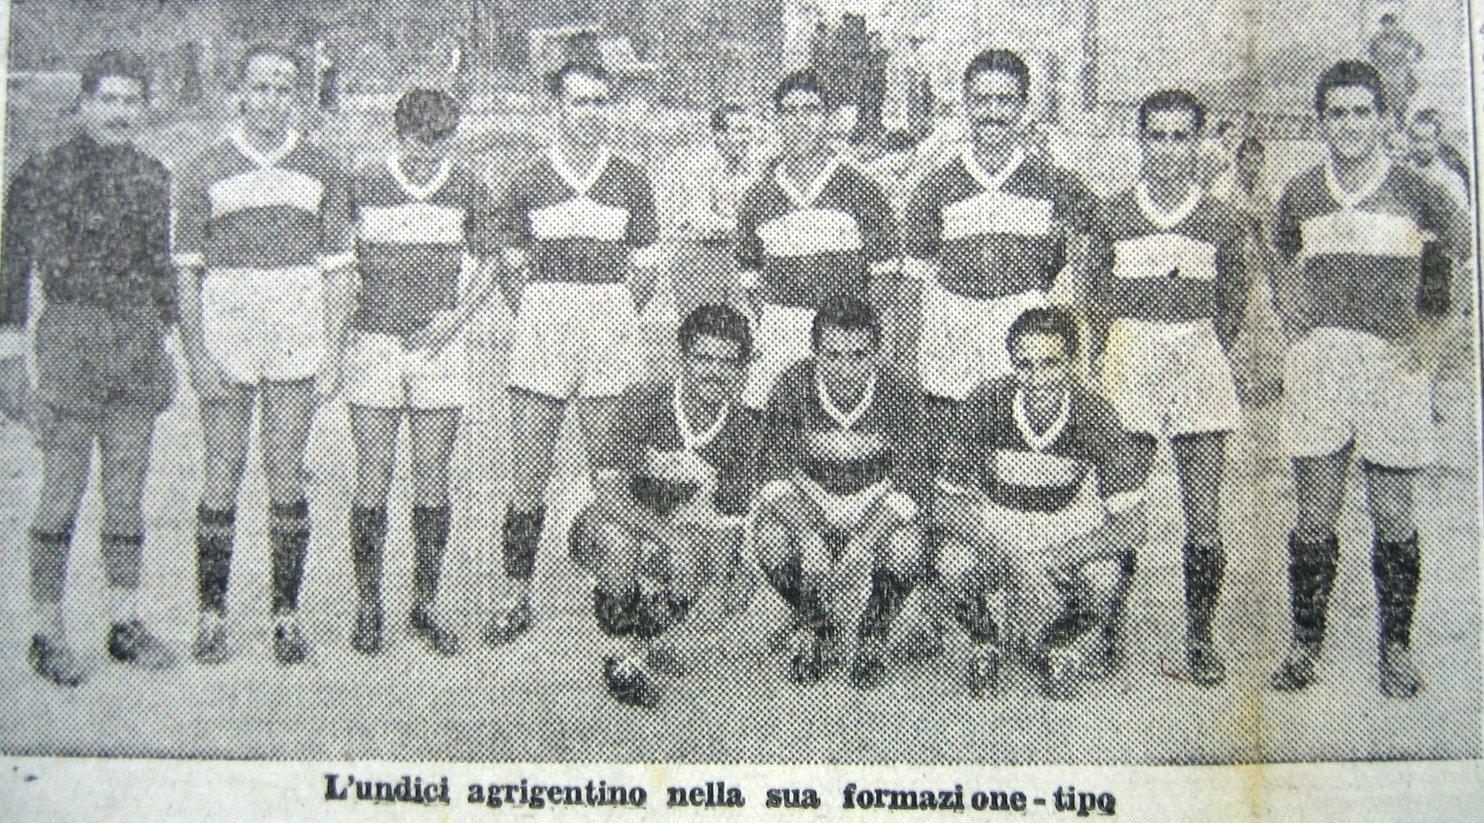 Akragas calcio Storia: 13 ottobre 1947